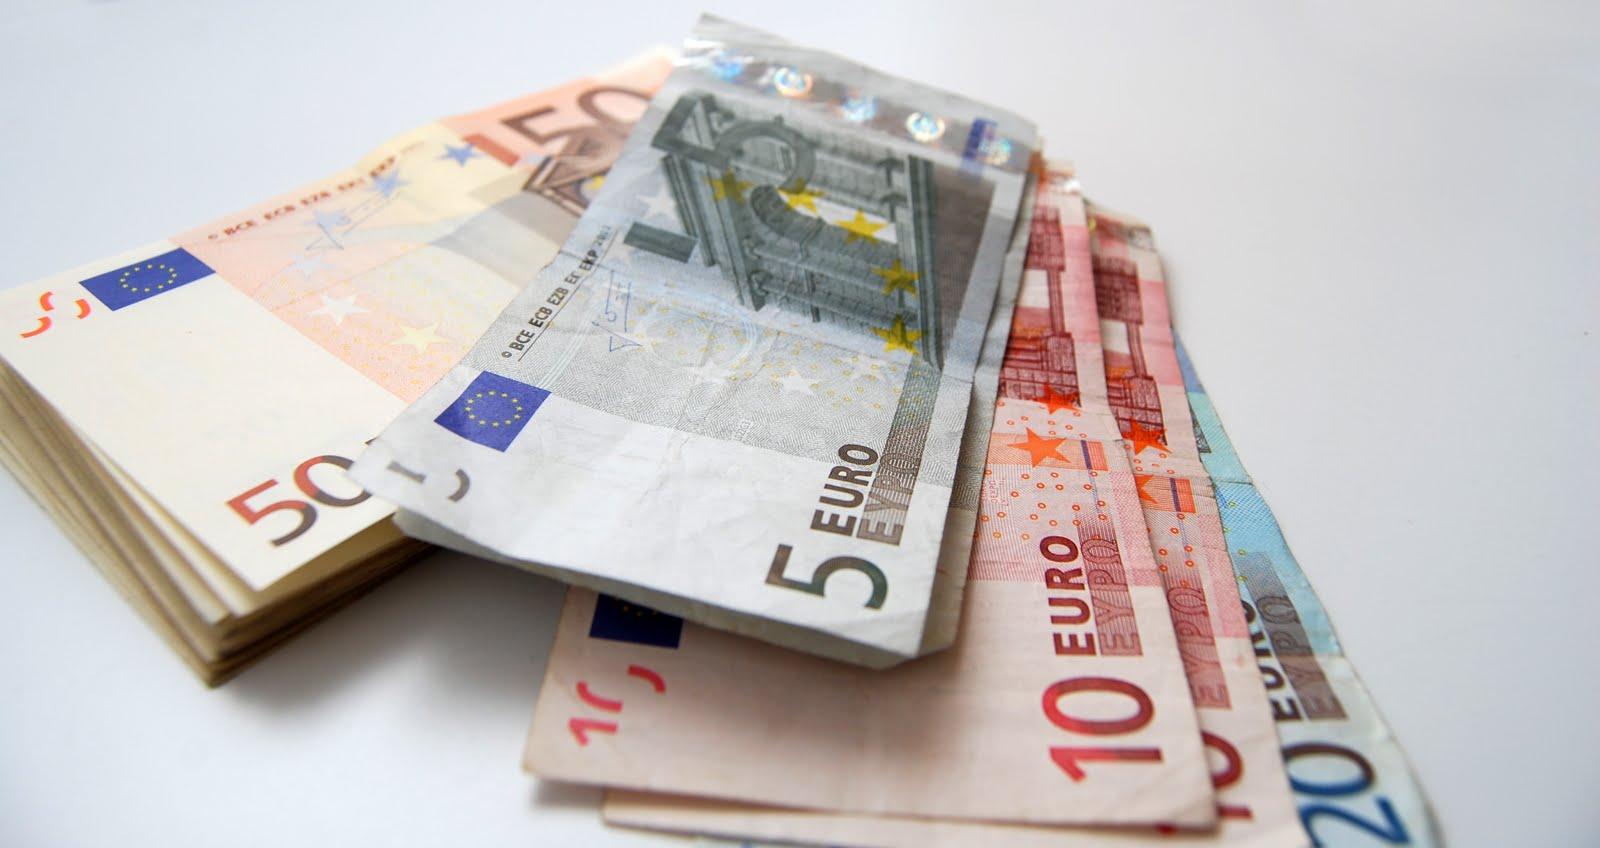 Curs valutar dolar leu